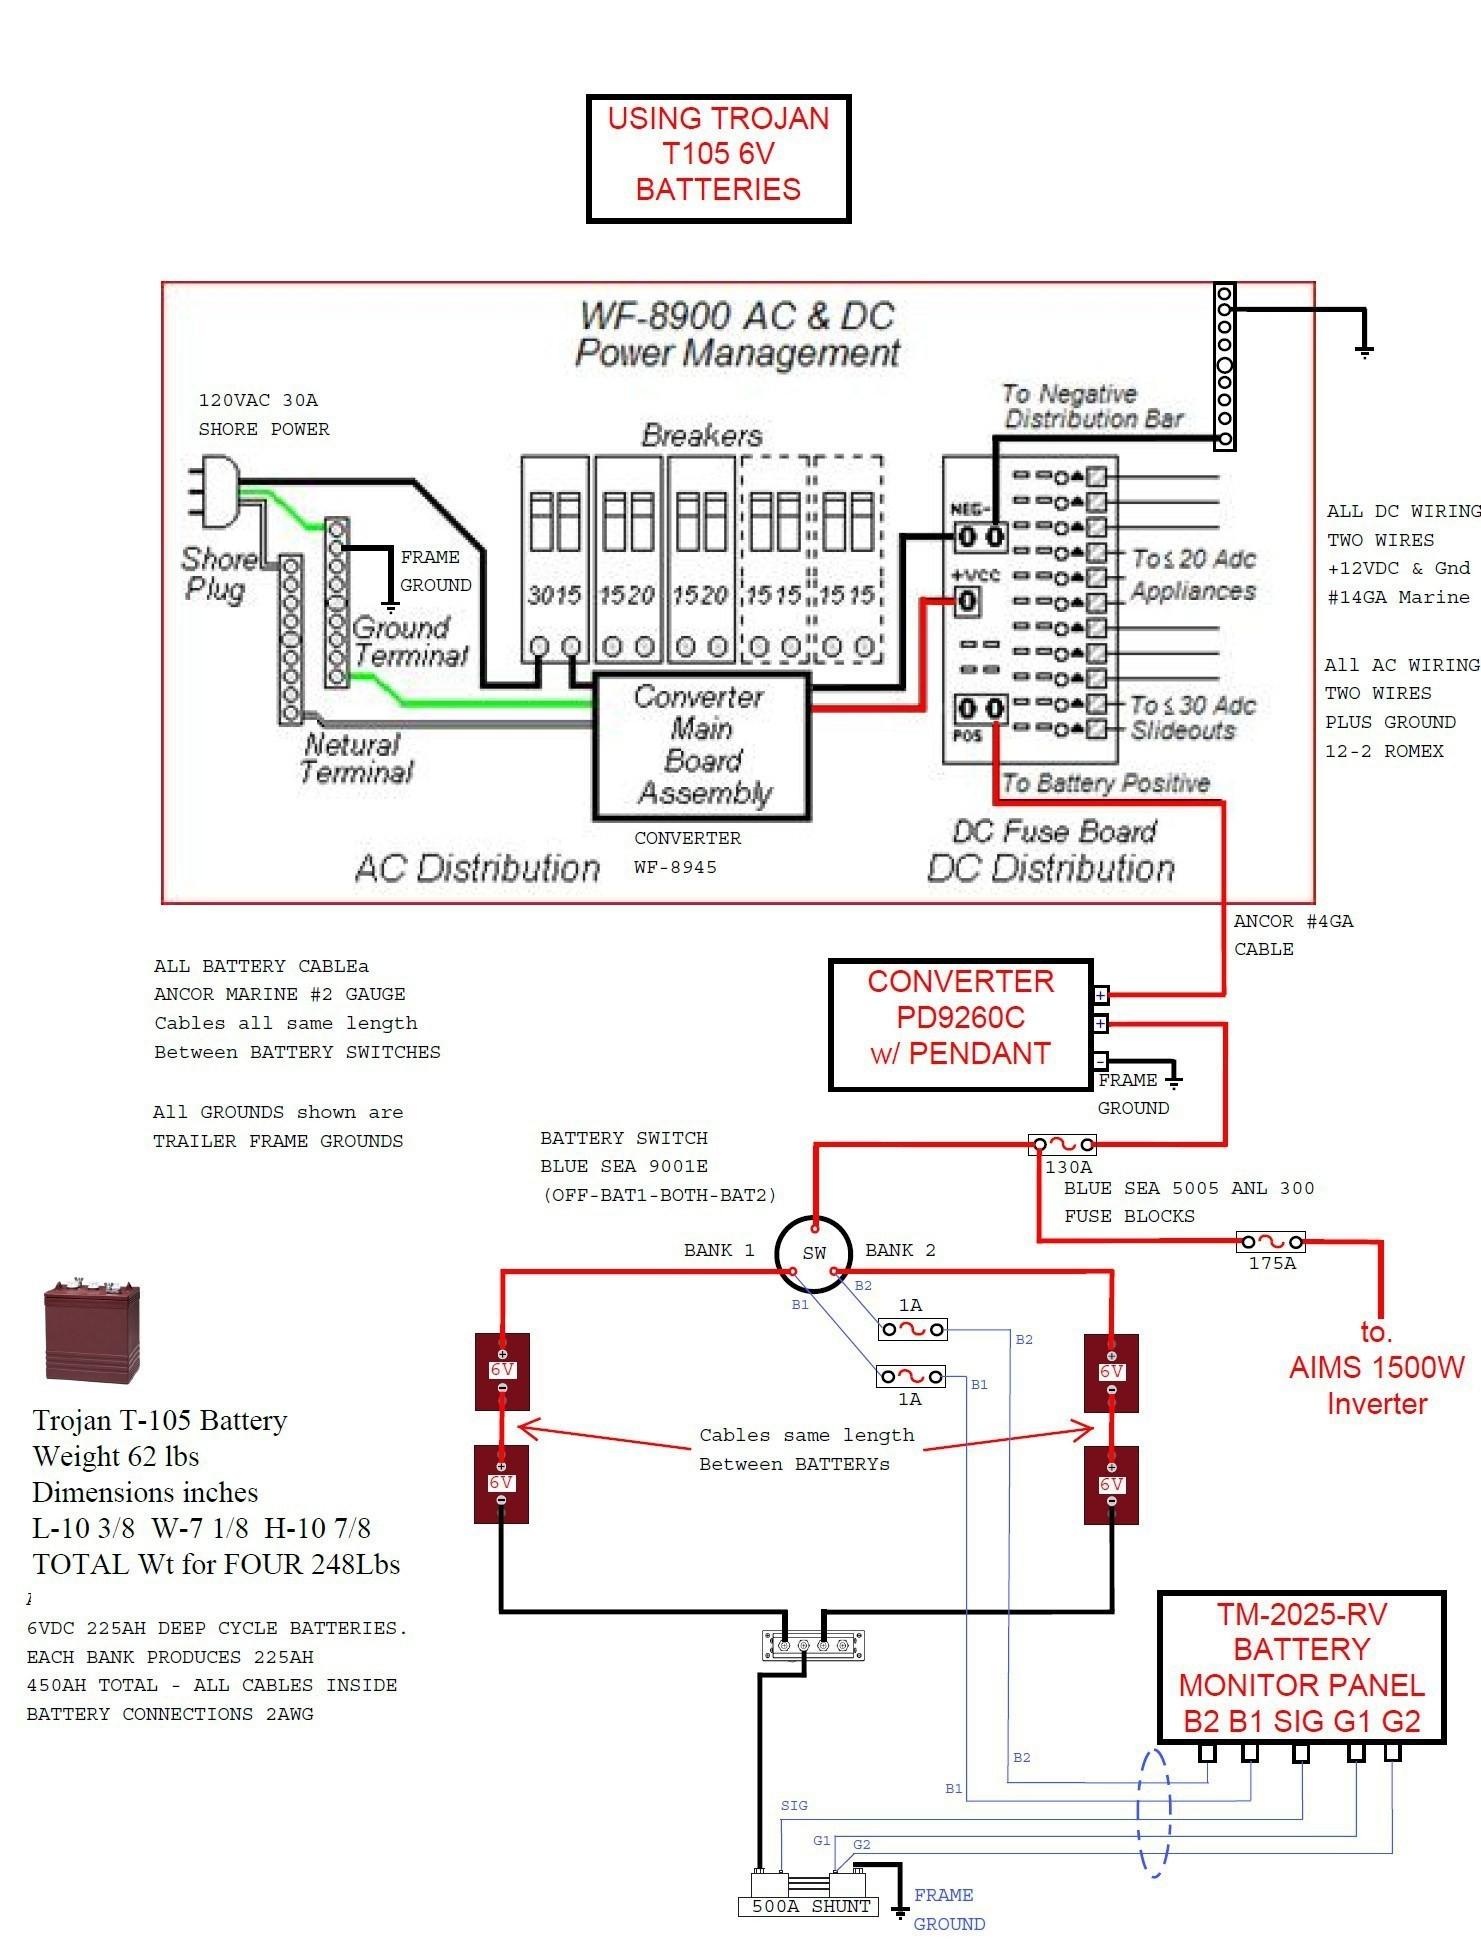 Rv Monitor Panel Wiring Diagram My Wiring Diagram Keystone Monitor Panel Wiring Diagram